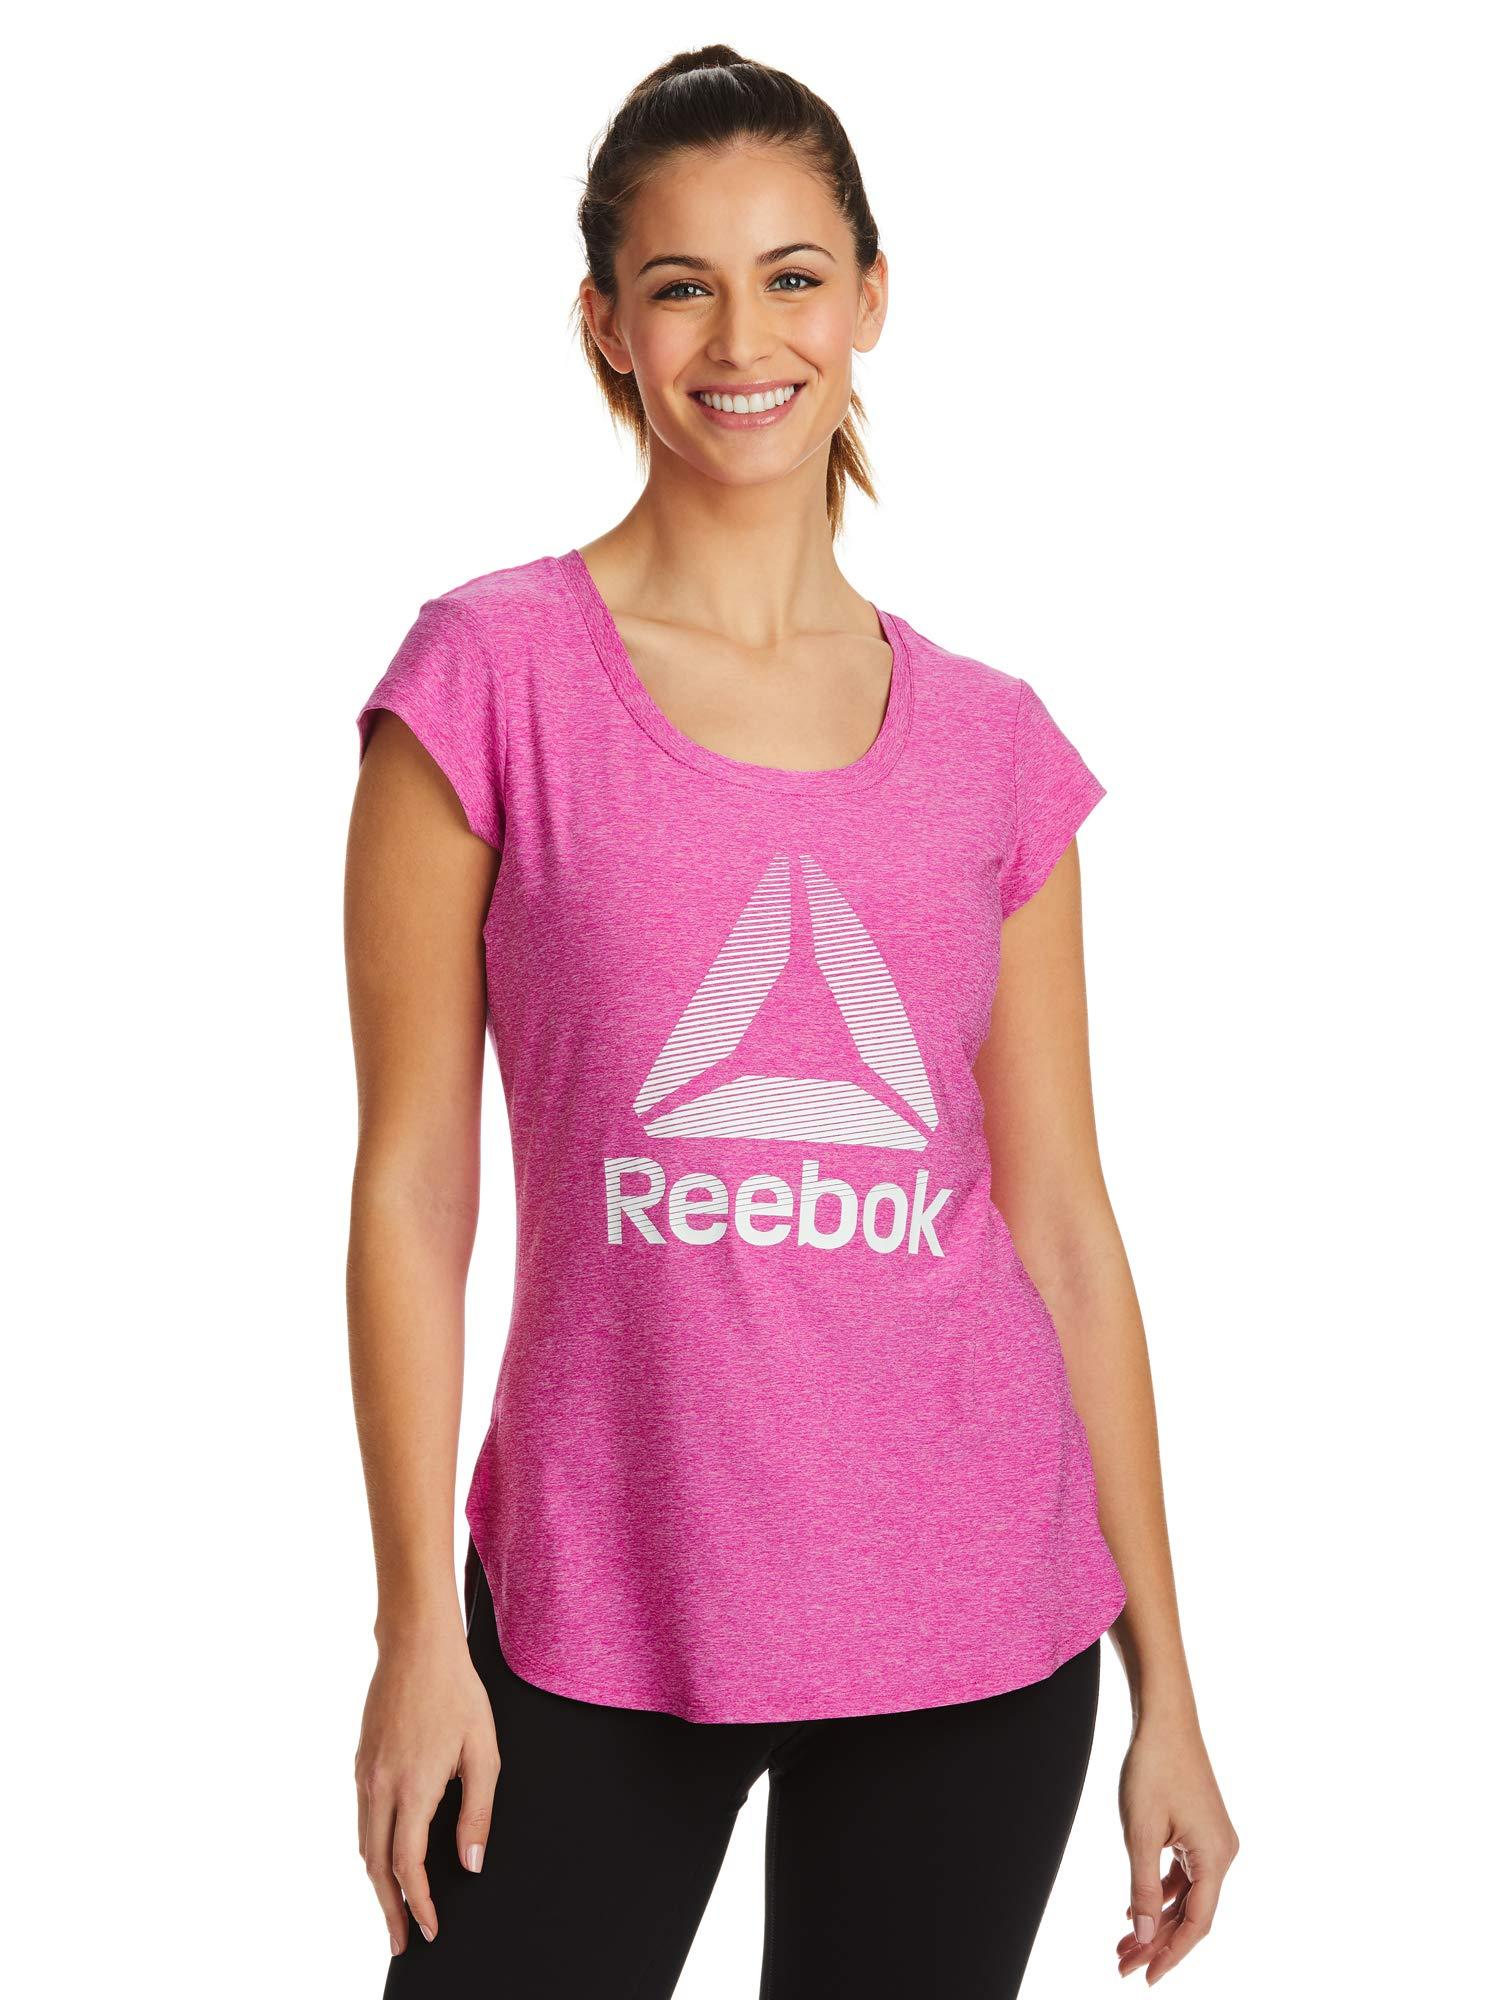 Reebok Women's Legend Performance Top Short Sleeve T-Shirt - Fuchsia Heather, X-Small